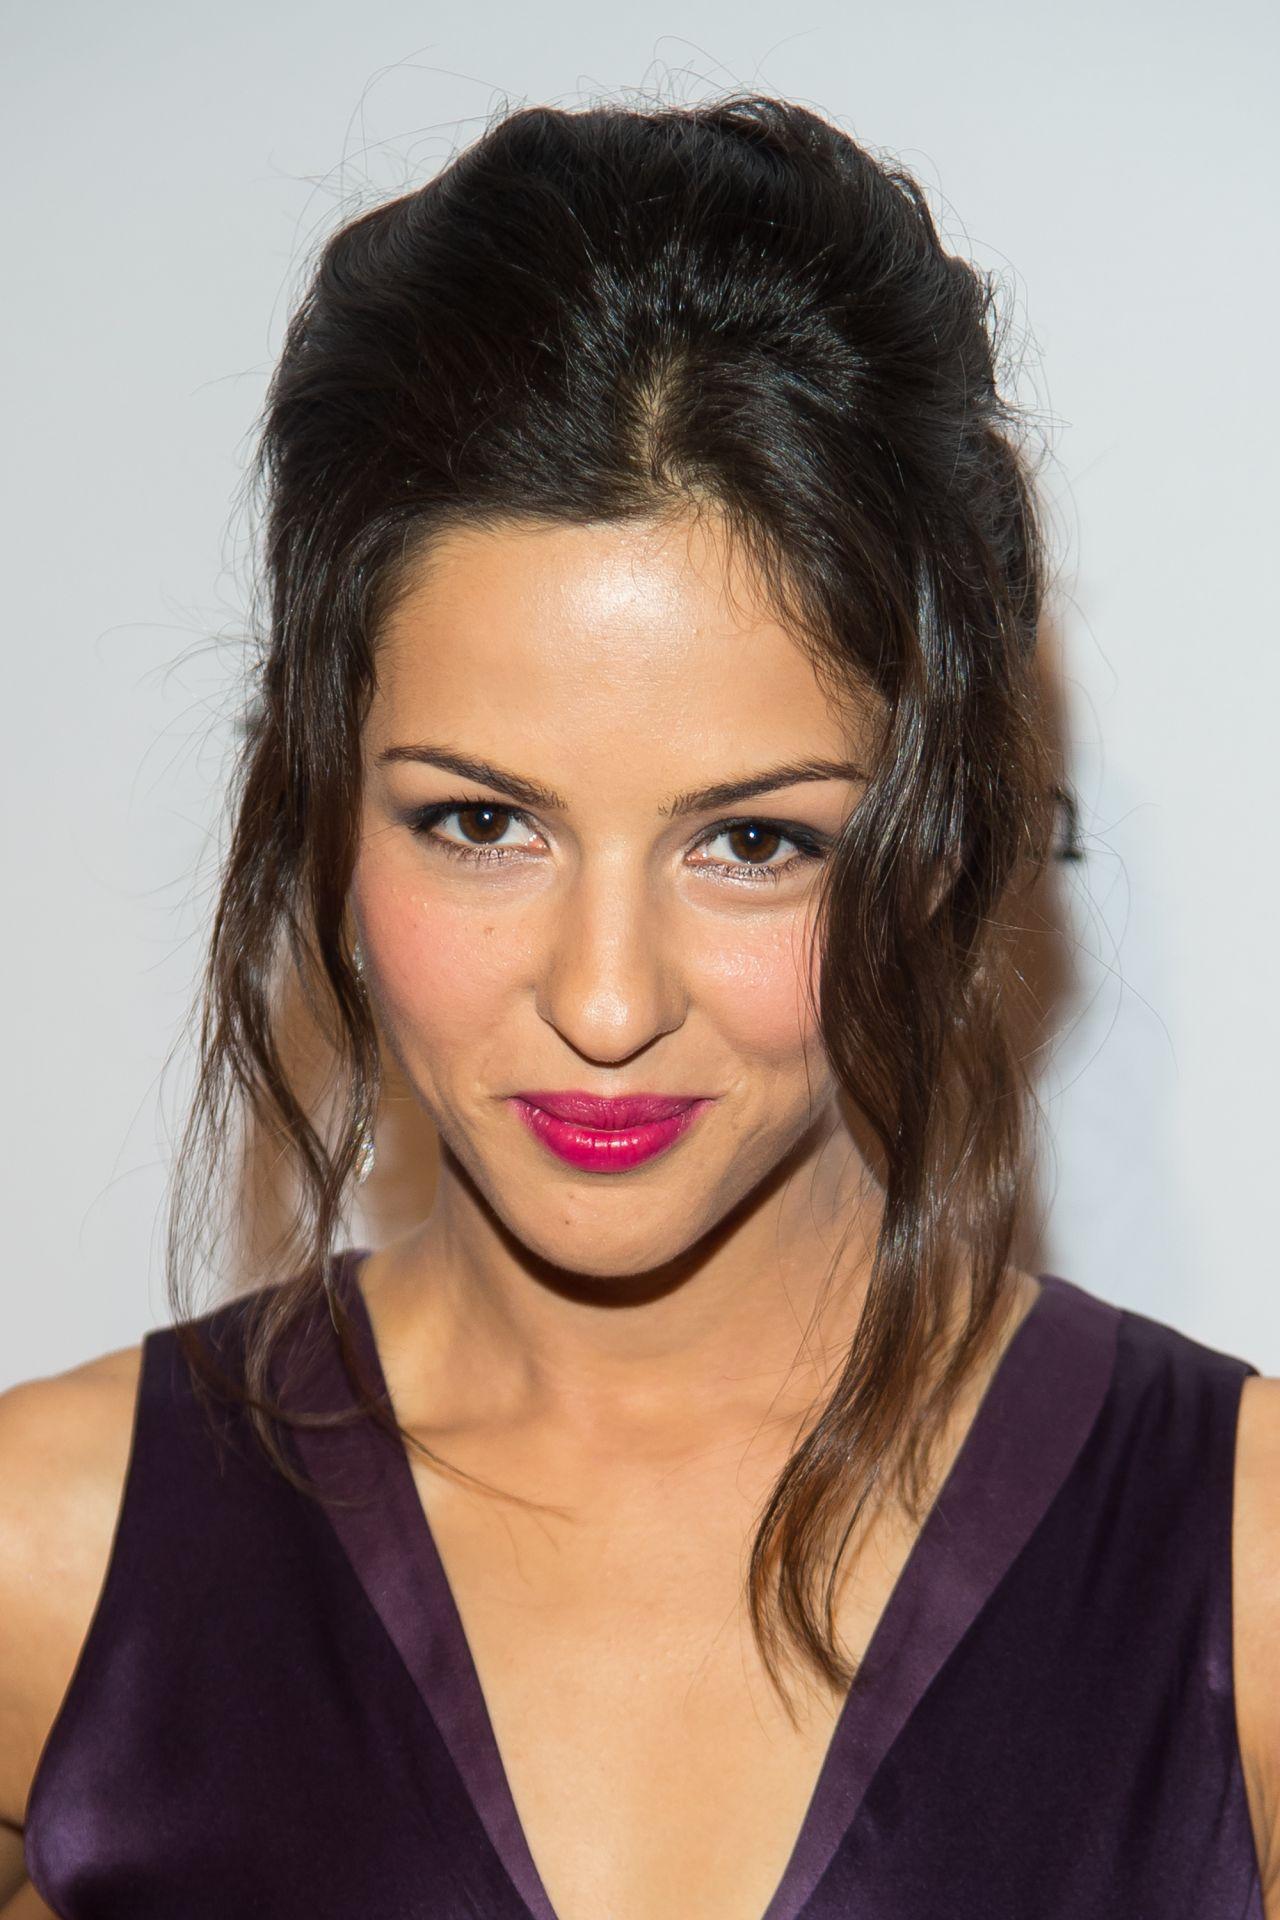 Annet Mahendru - 'The Americans' Season 4 Premiere in New ...